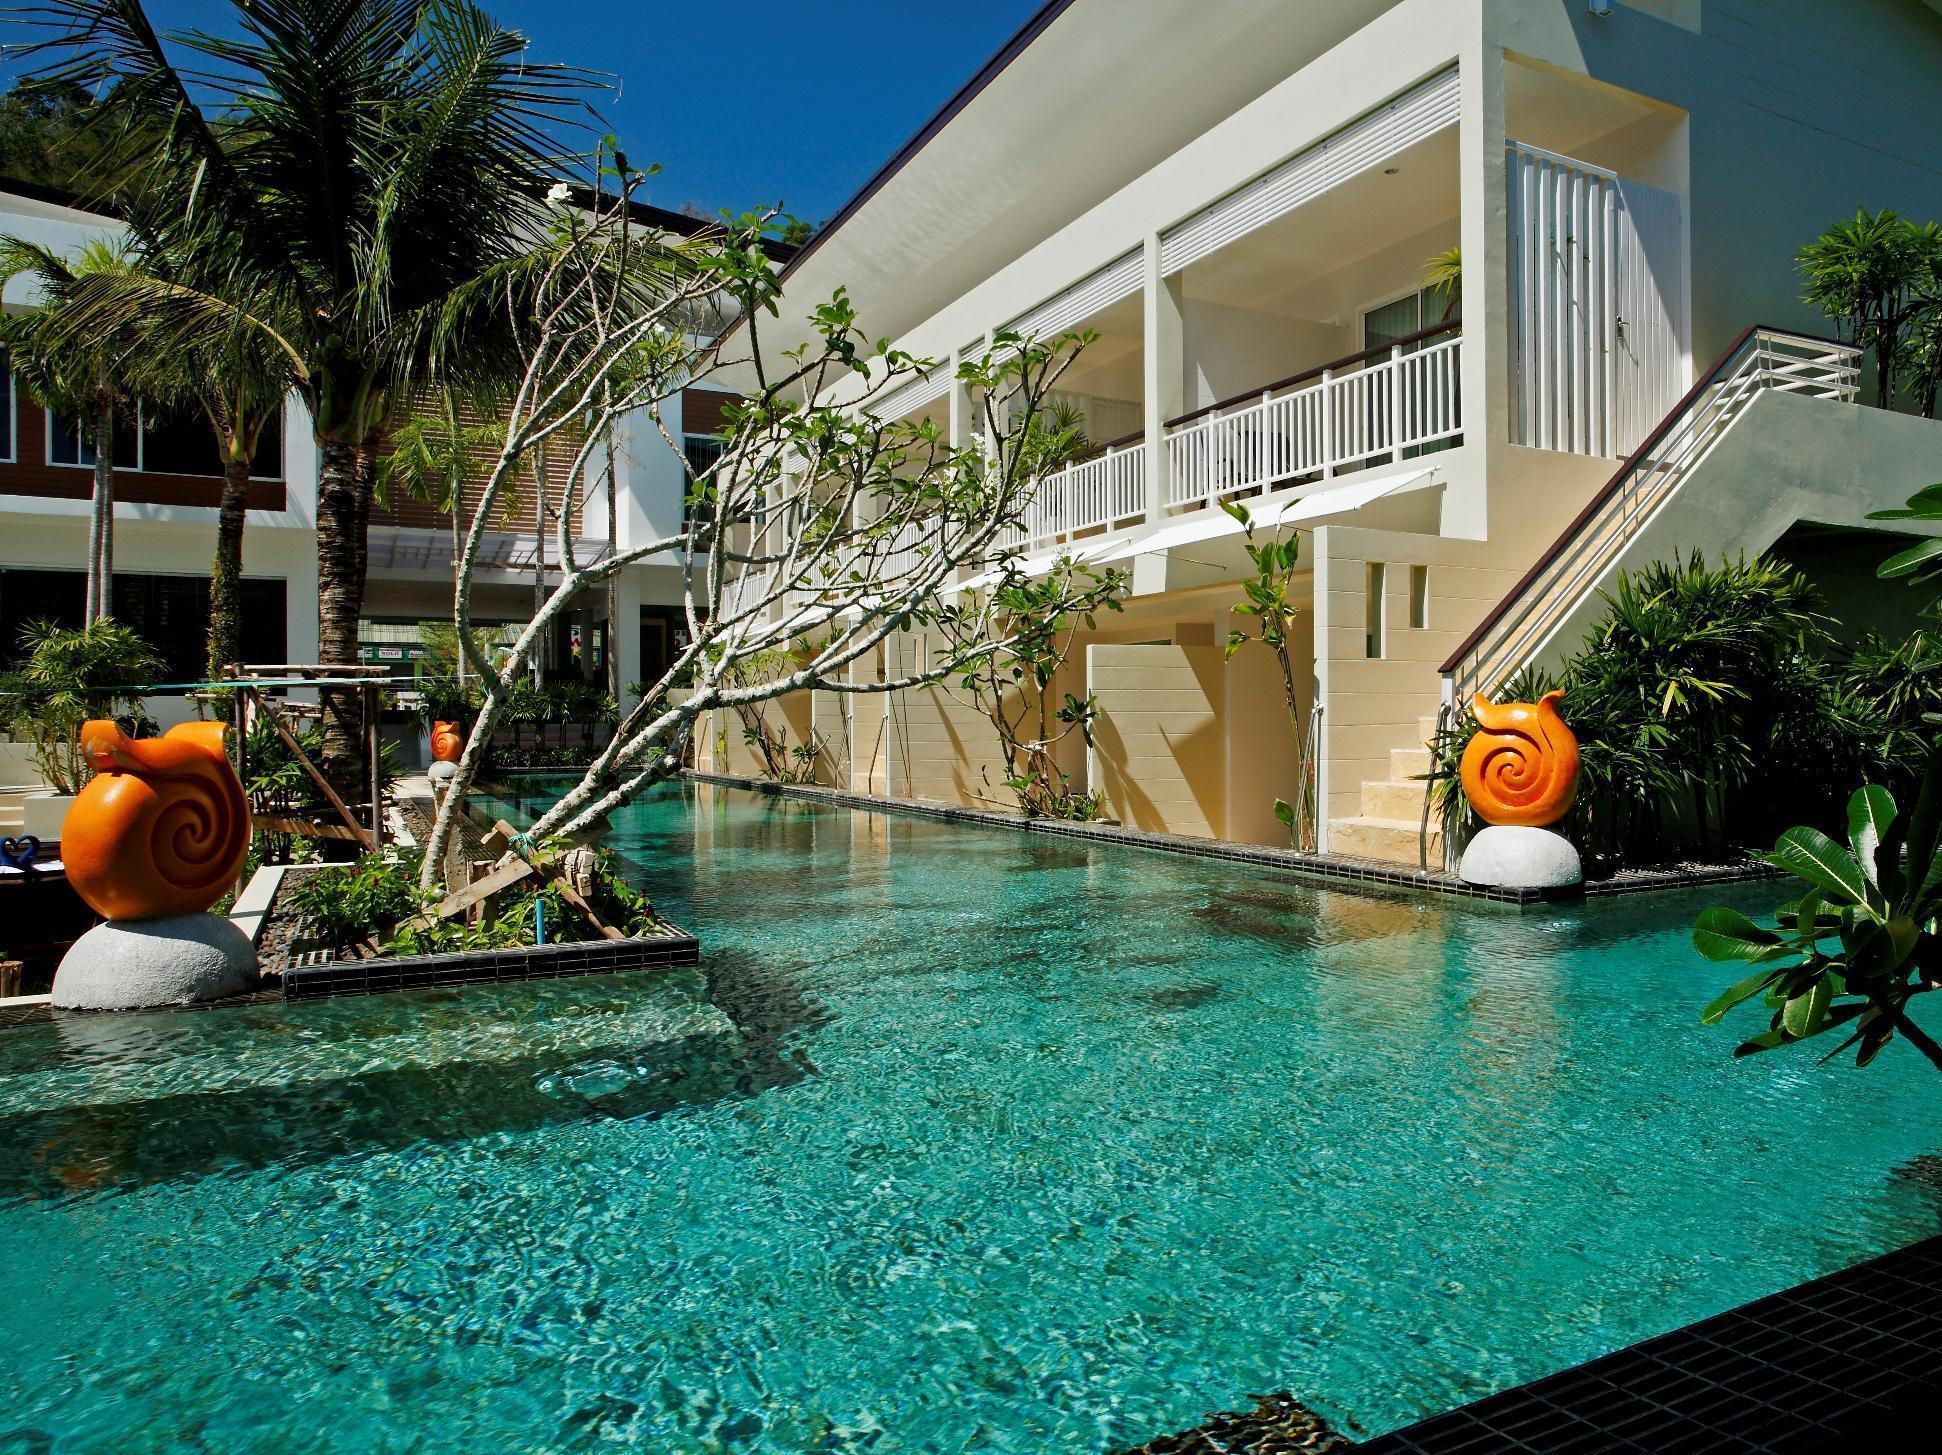 A2 Boutique Resort เอ2 บูทิก รีสอร์ต